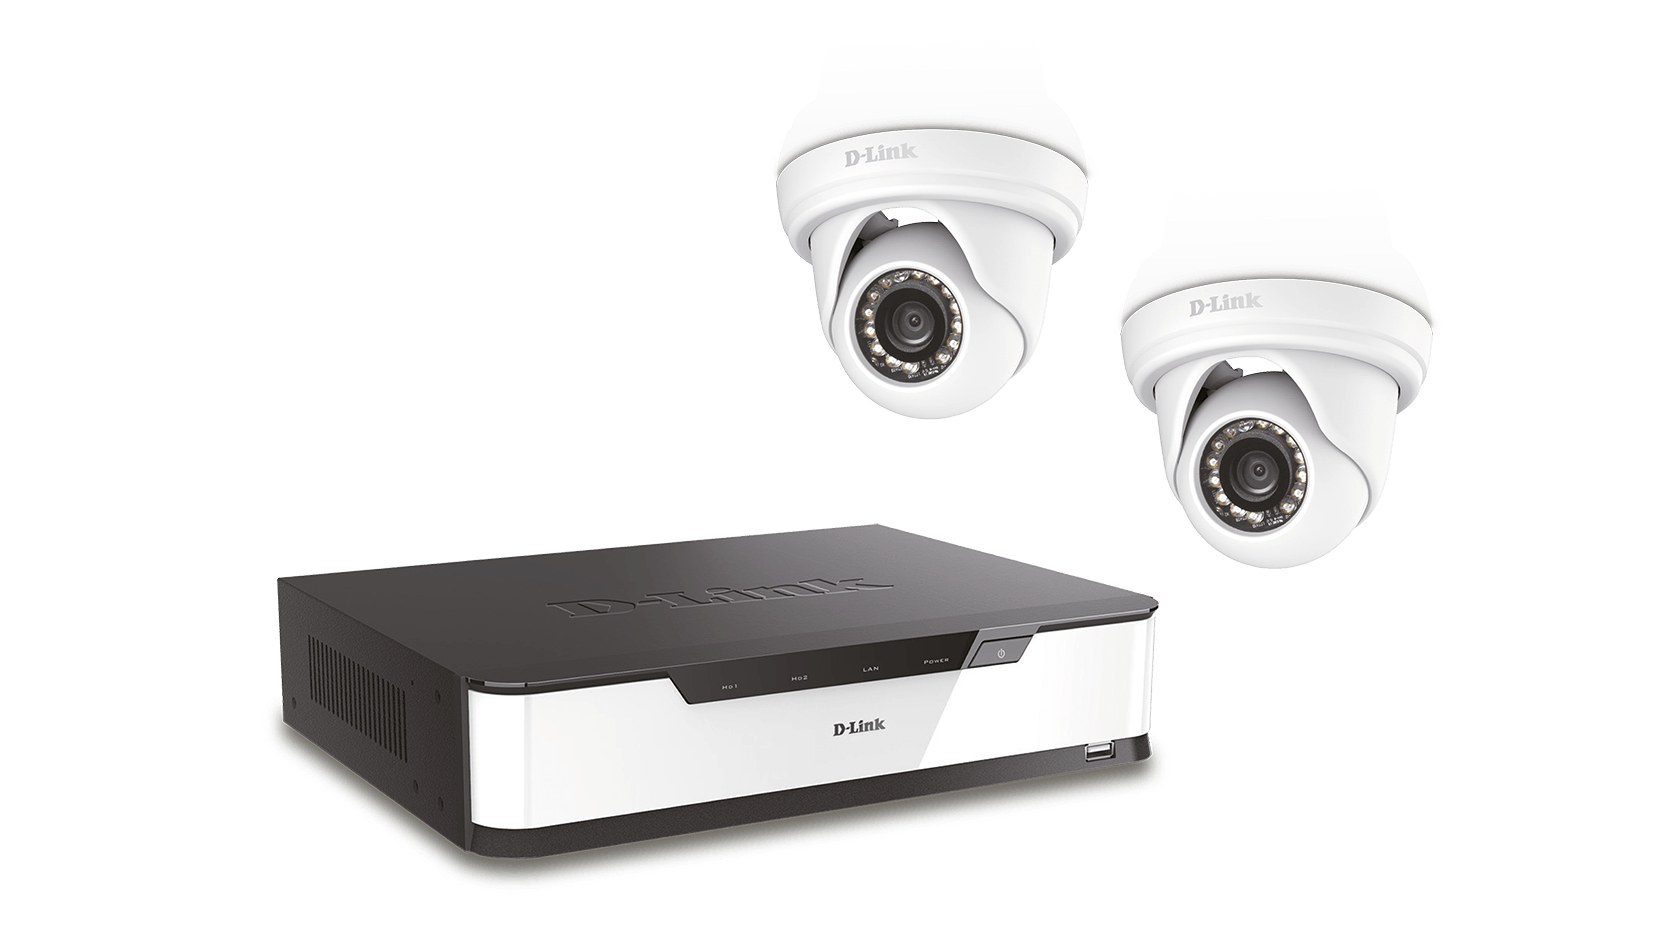 D-Link DNR16-4802-2 Wired & Wireless 16channels video surveillance kit